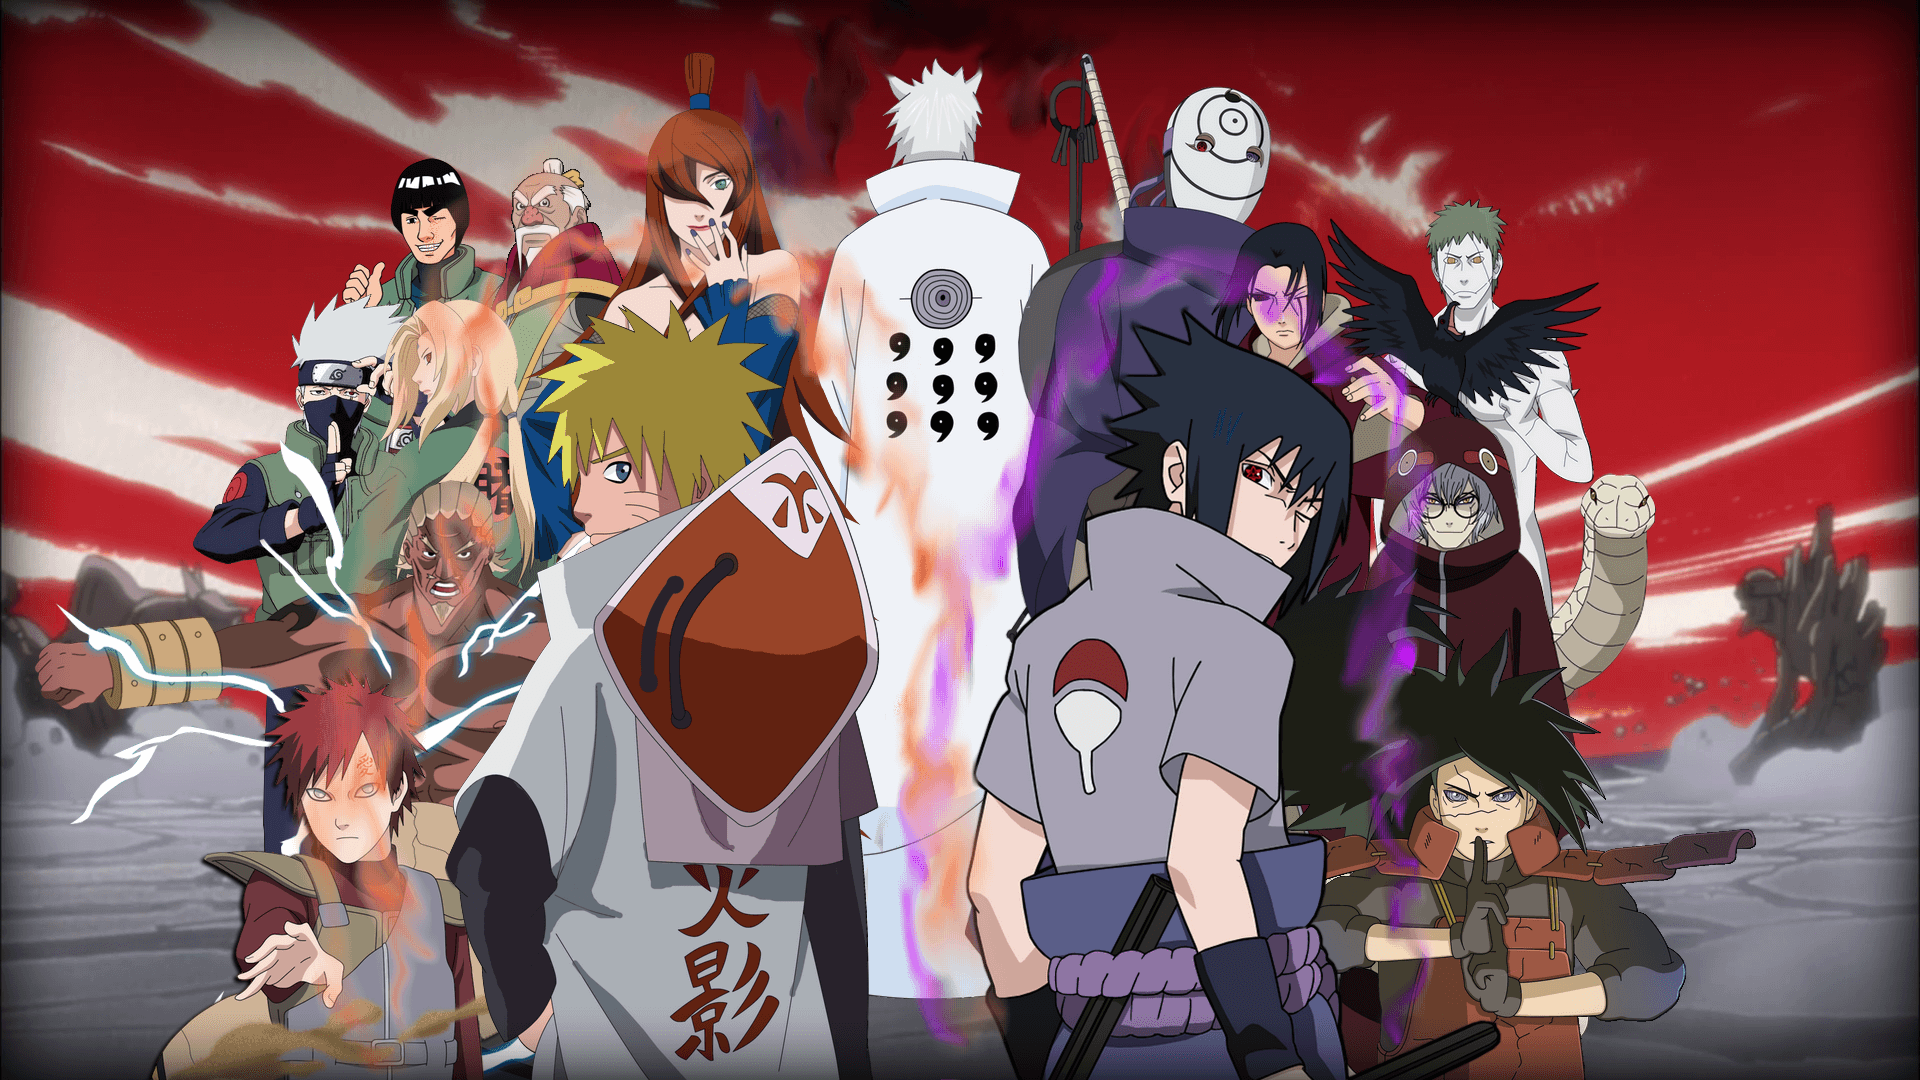 40 Hd Wallpaper Naruto Shippuden 3d: Naruto Wallpapers HD 2016